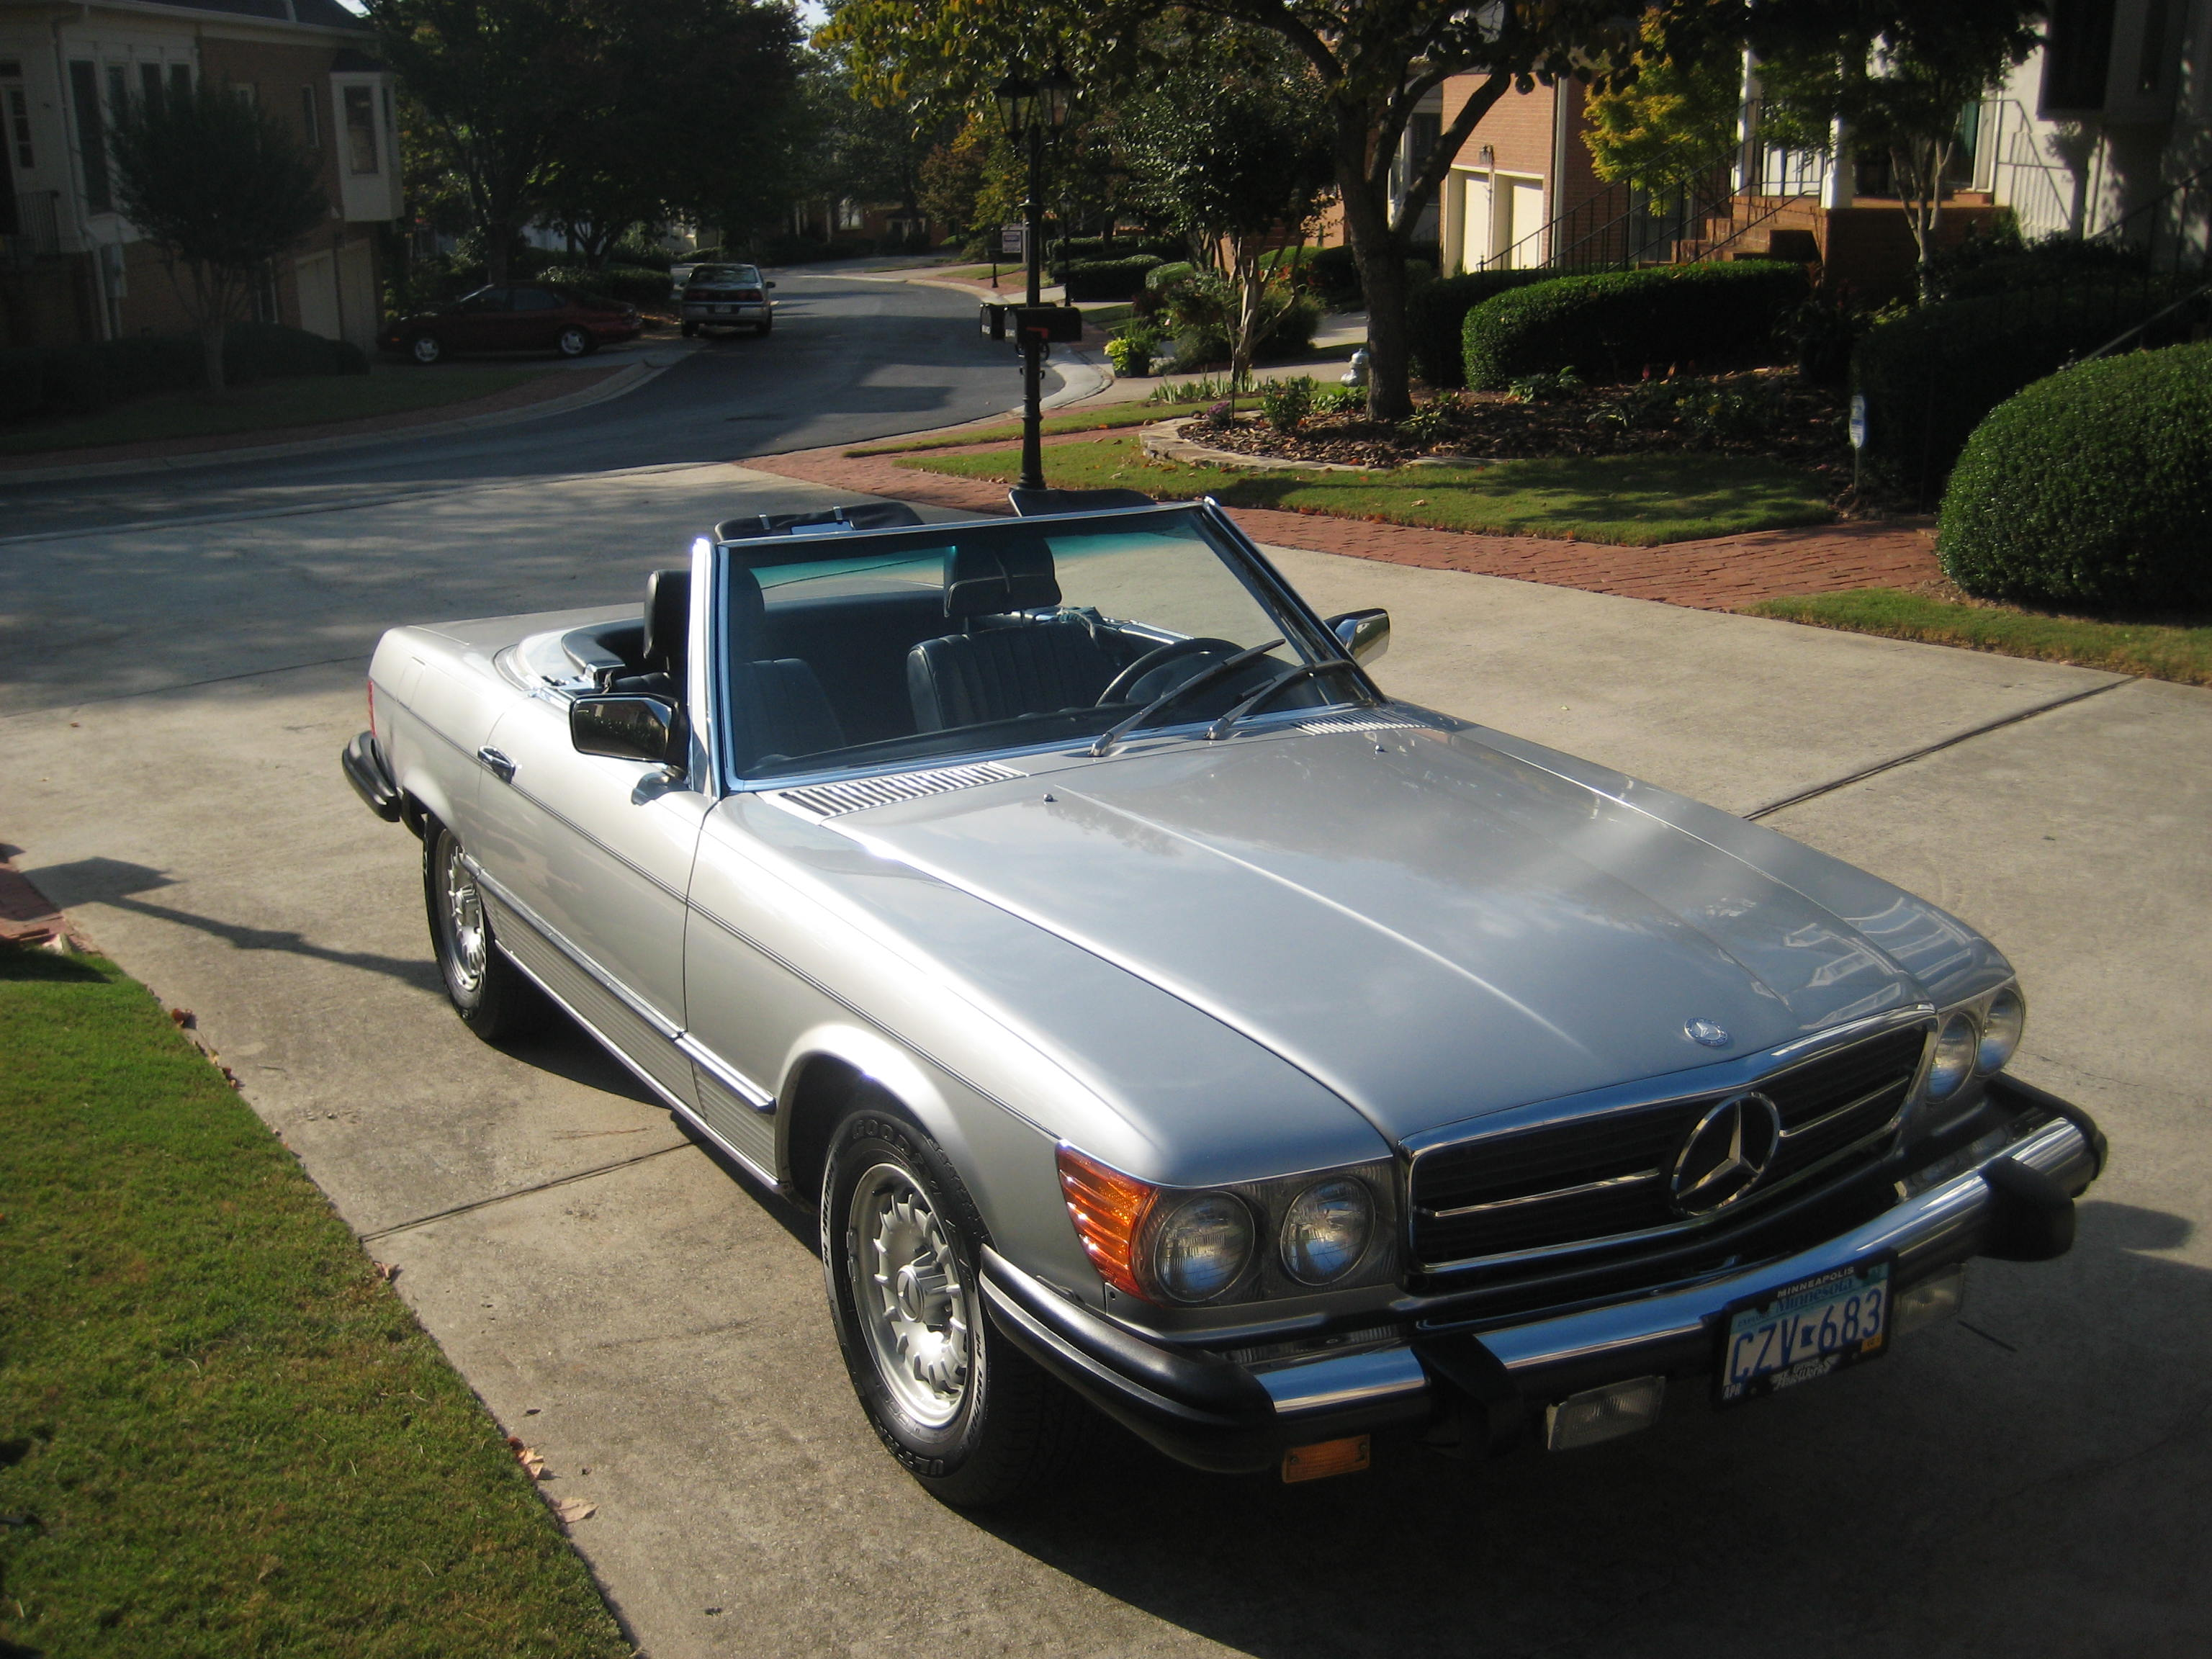 Mercedes benz 380sl picture 11 reviews news specs for 380sl mercedes benz